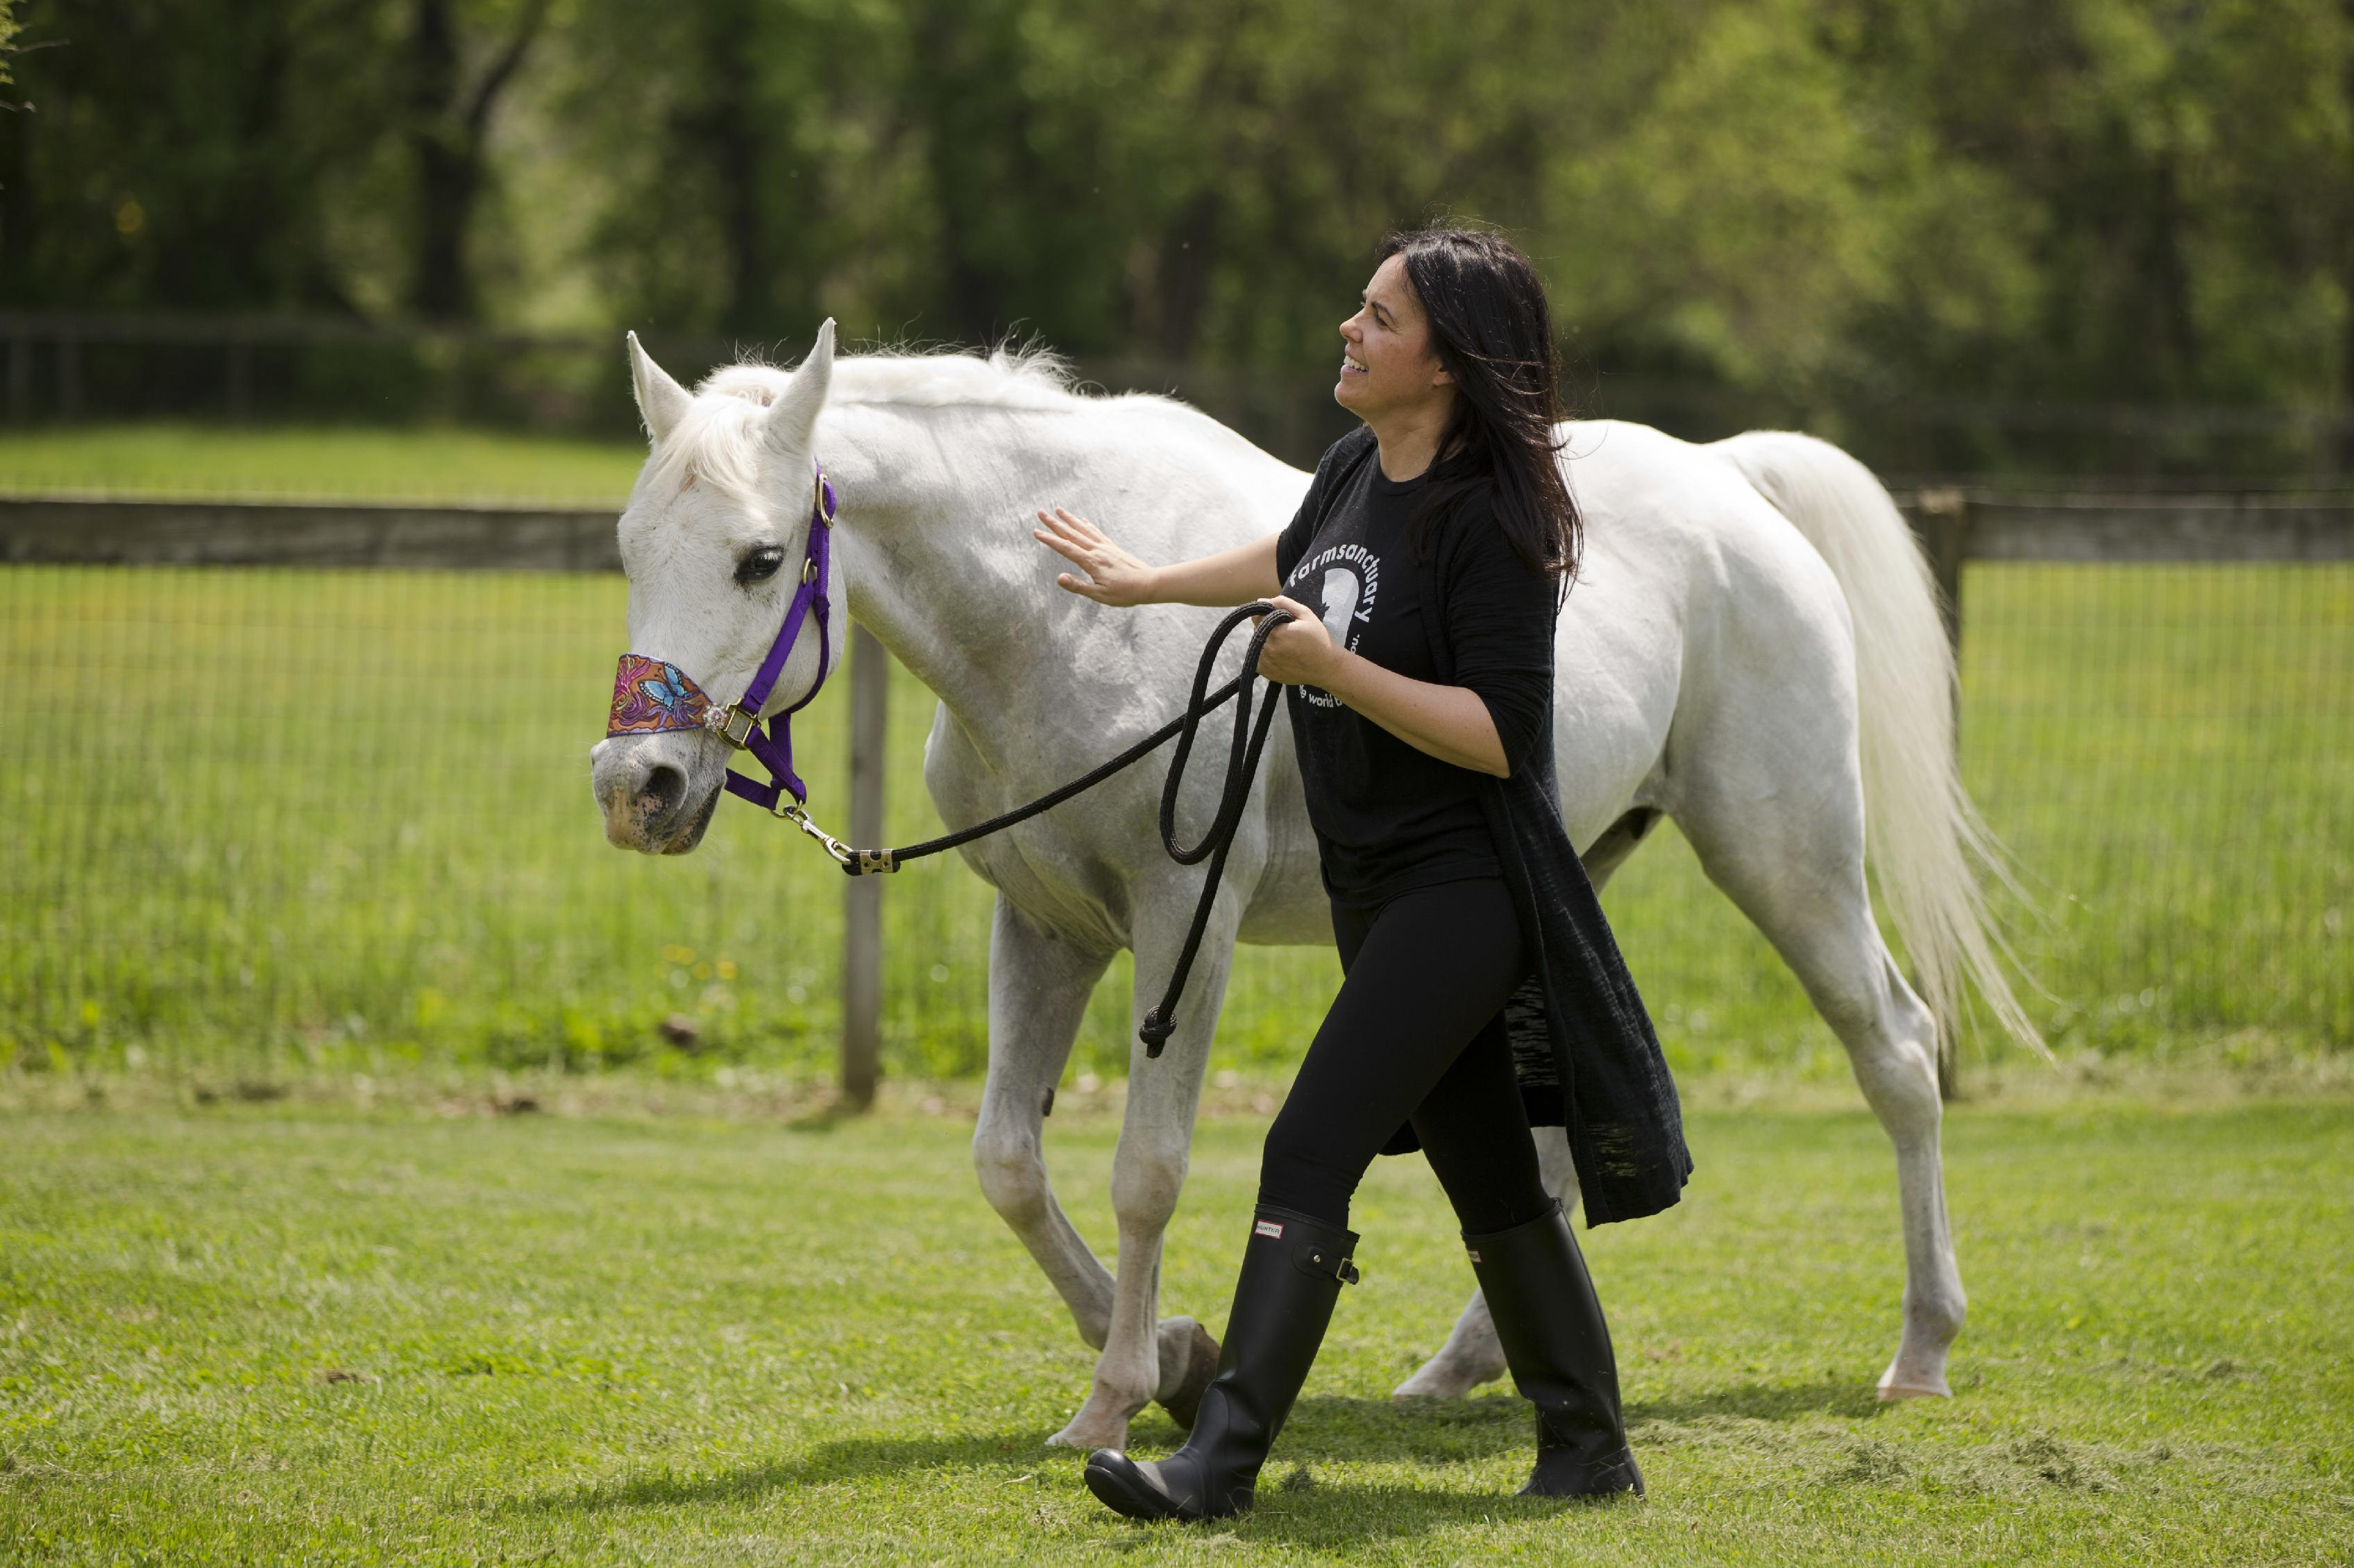 Jon Stewart adopts paint-covered horse; ex-owner backs care